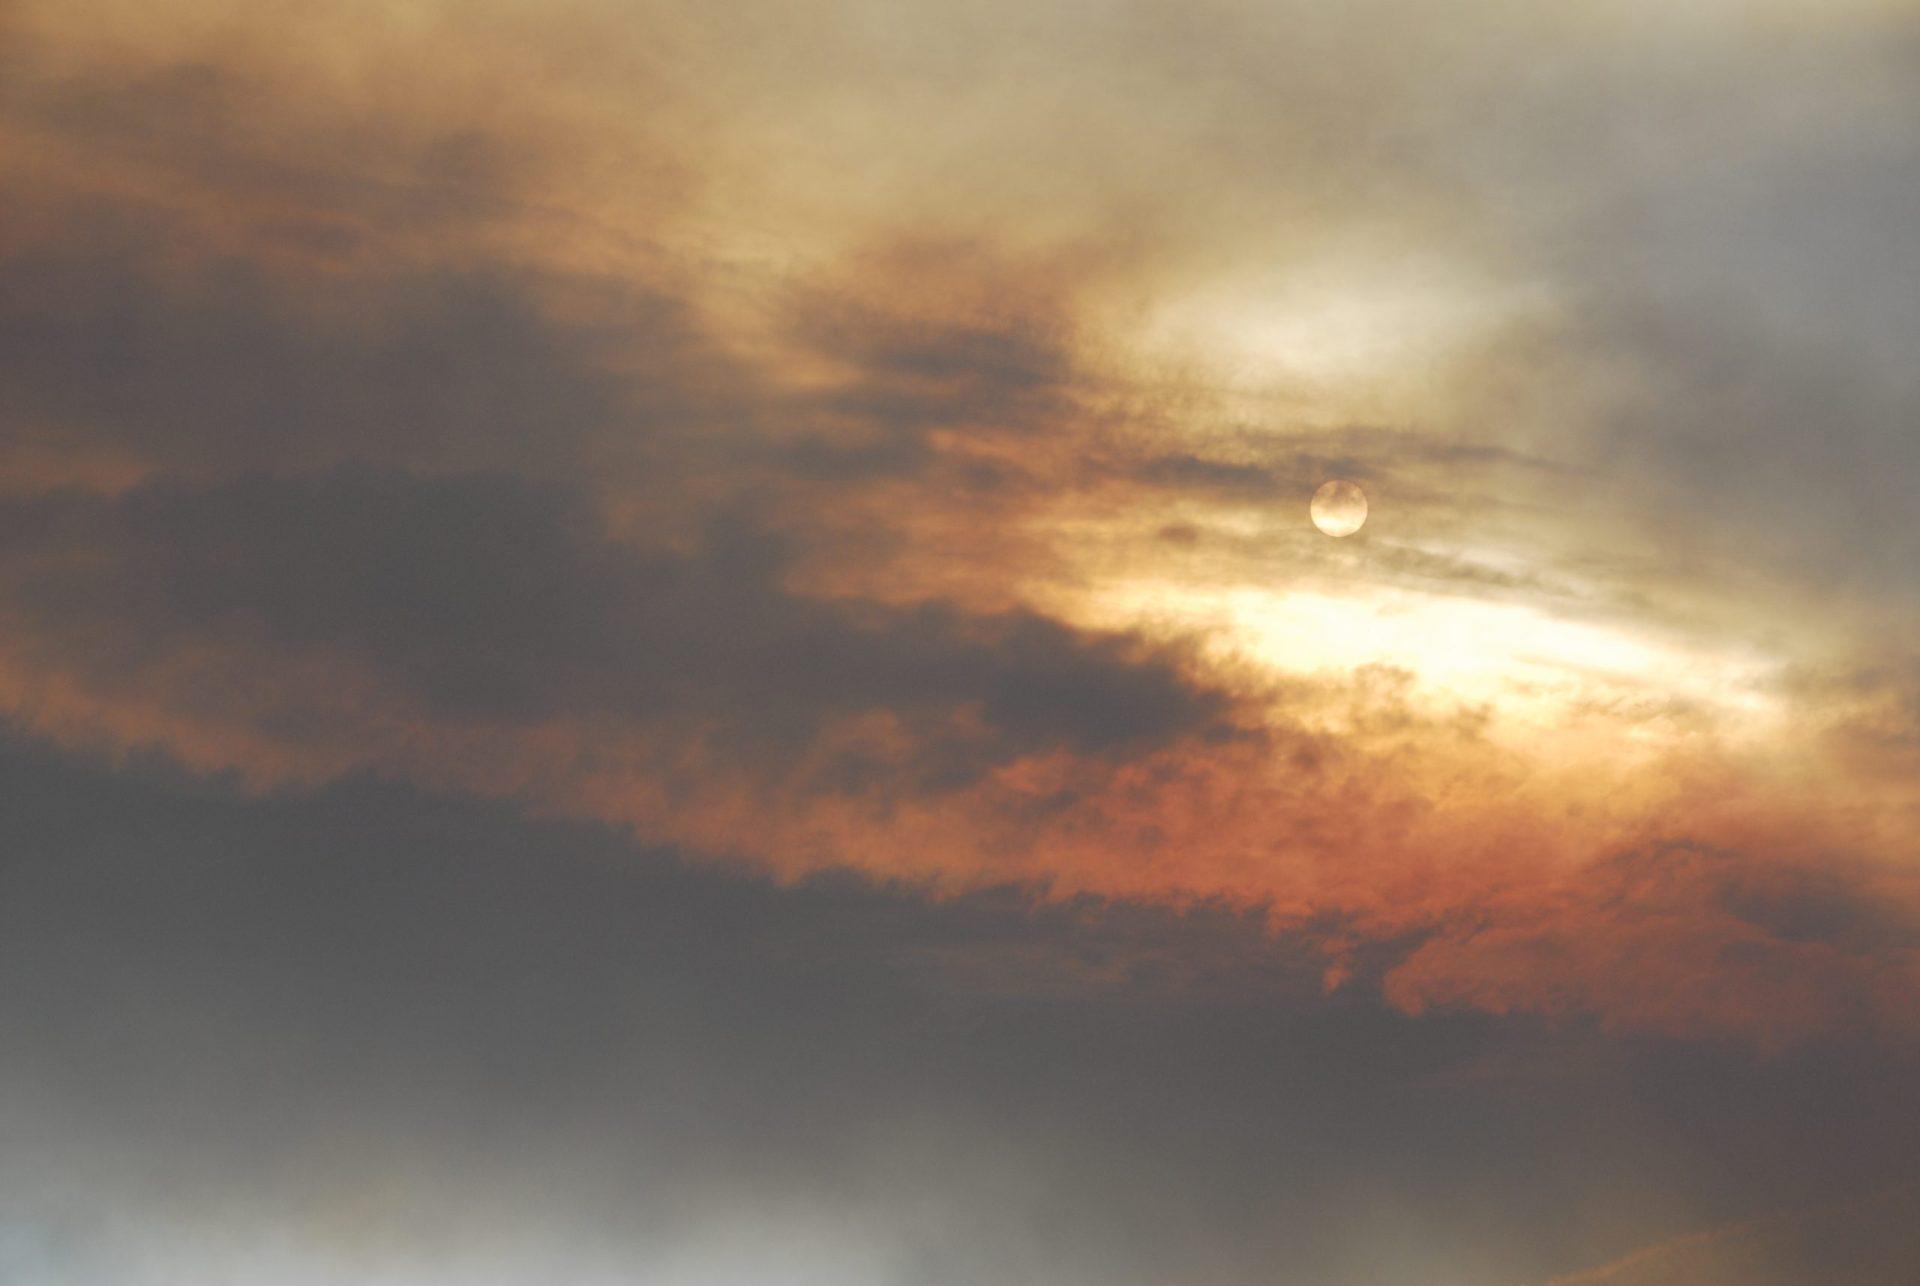 Smoky skies in the Great Basin. Image: Bob Conrad.